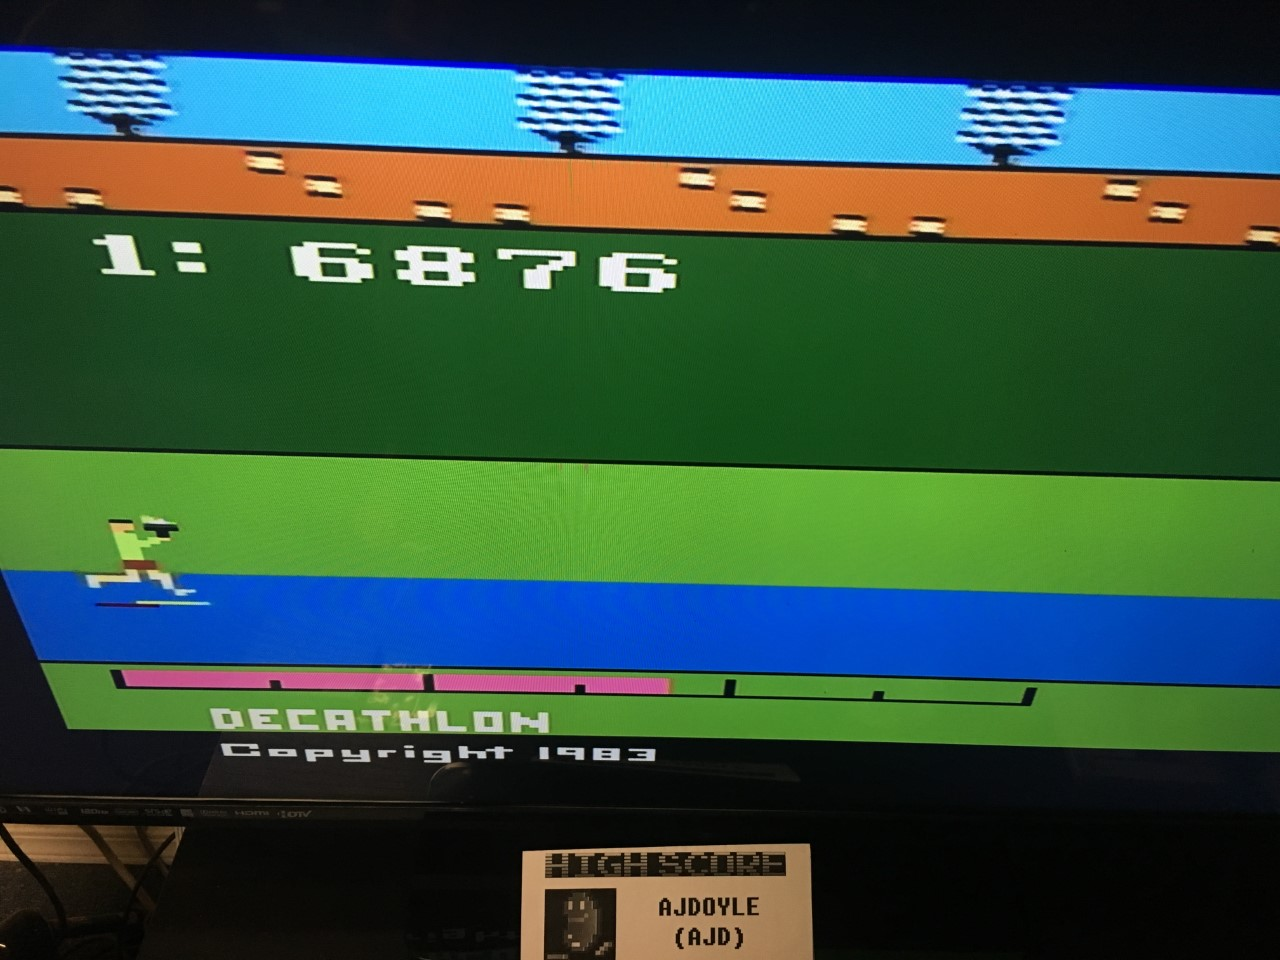 ajdoyle: Activision Decathlon (Atari 2600 Emulated) 6,876 points on 2018-03-05 00:48:28